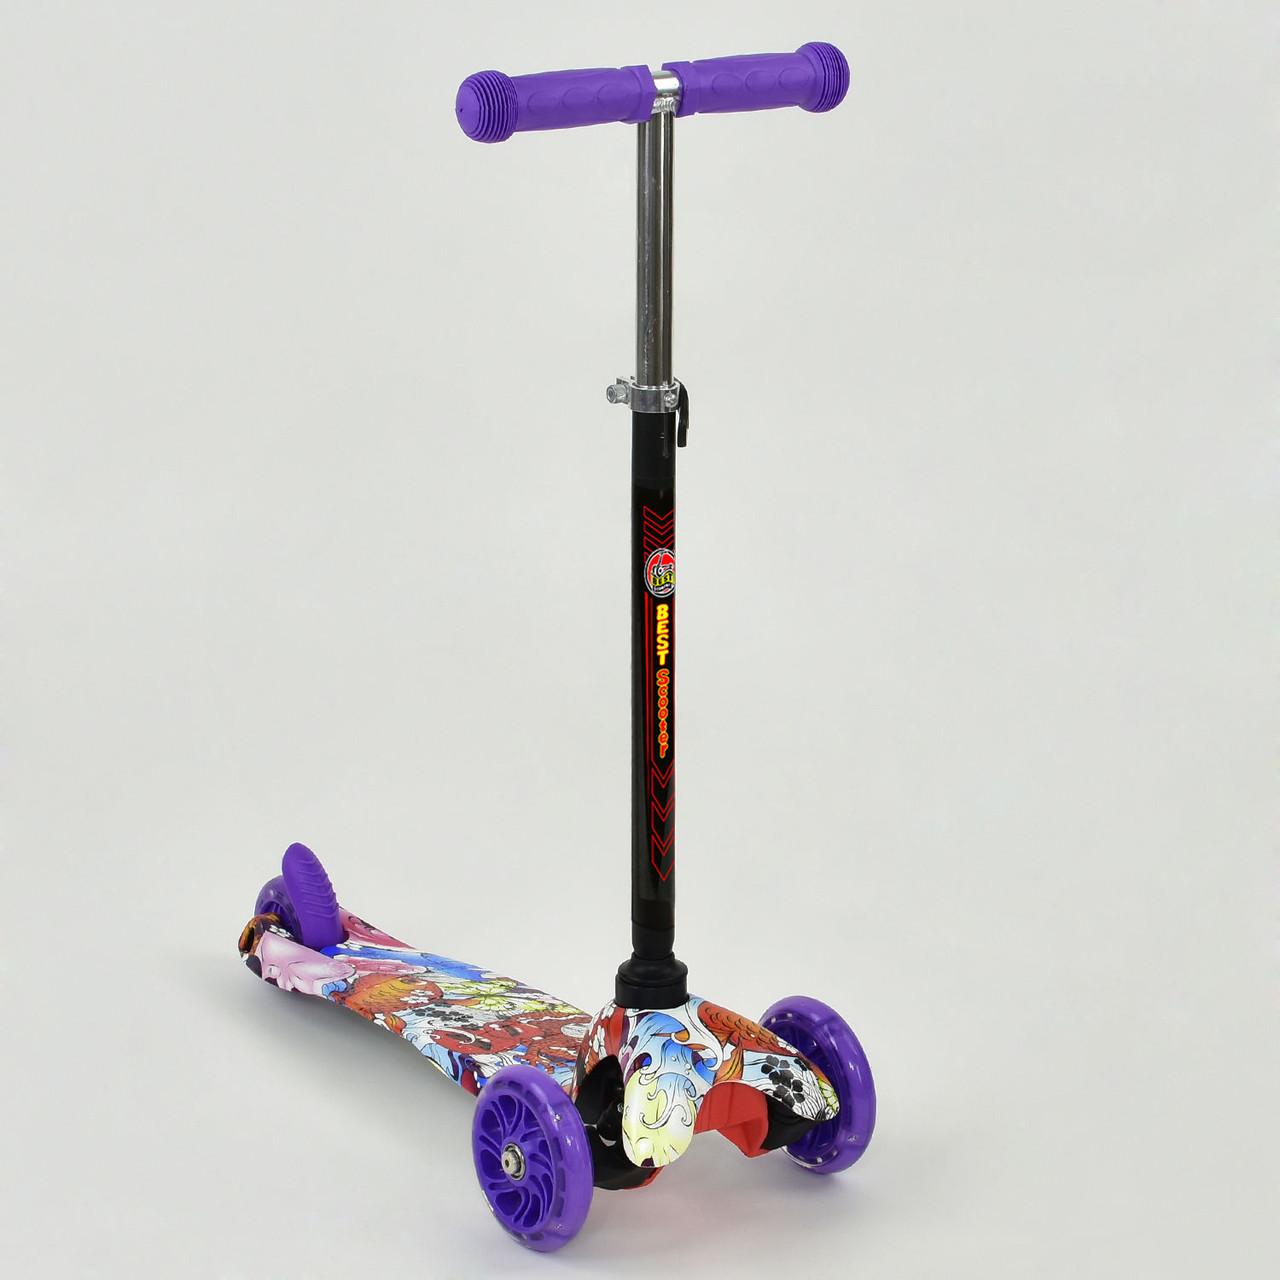 Самокат А 24696 /779-1298 MINI Best Scooter Светящиеся колеса PU Гарантия качества Быстрая доставка